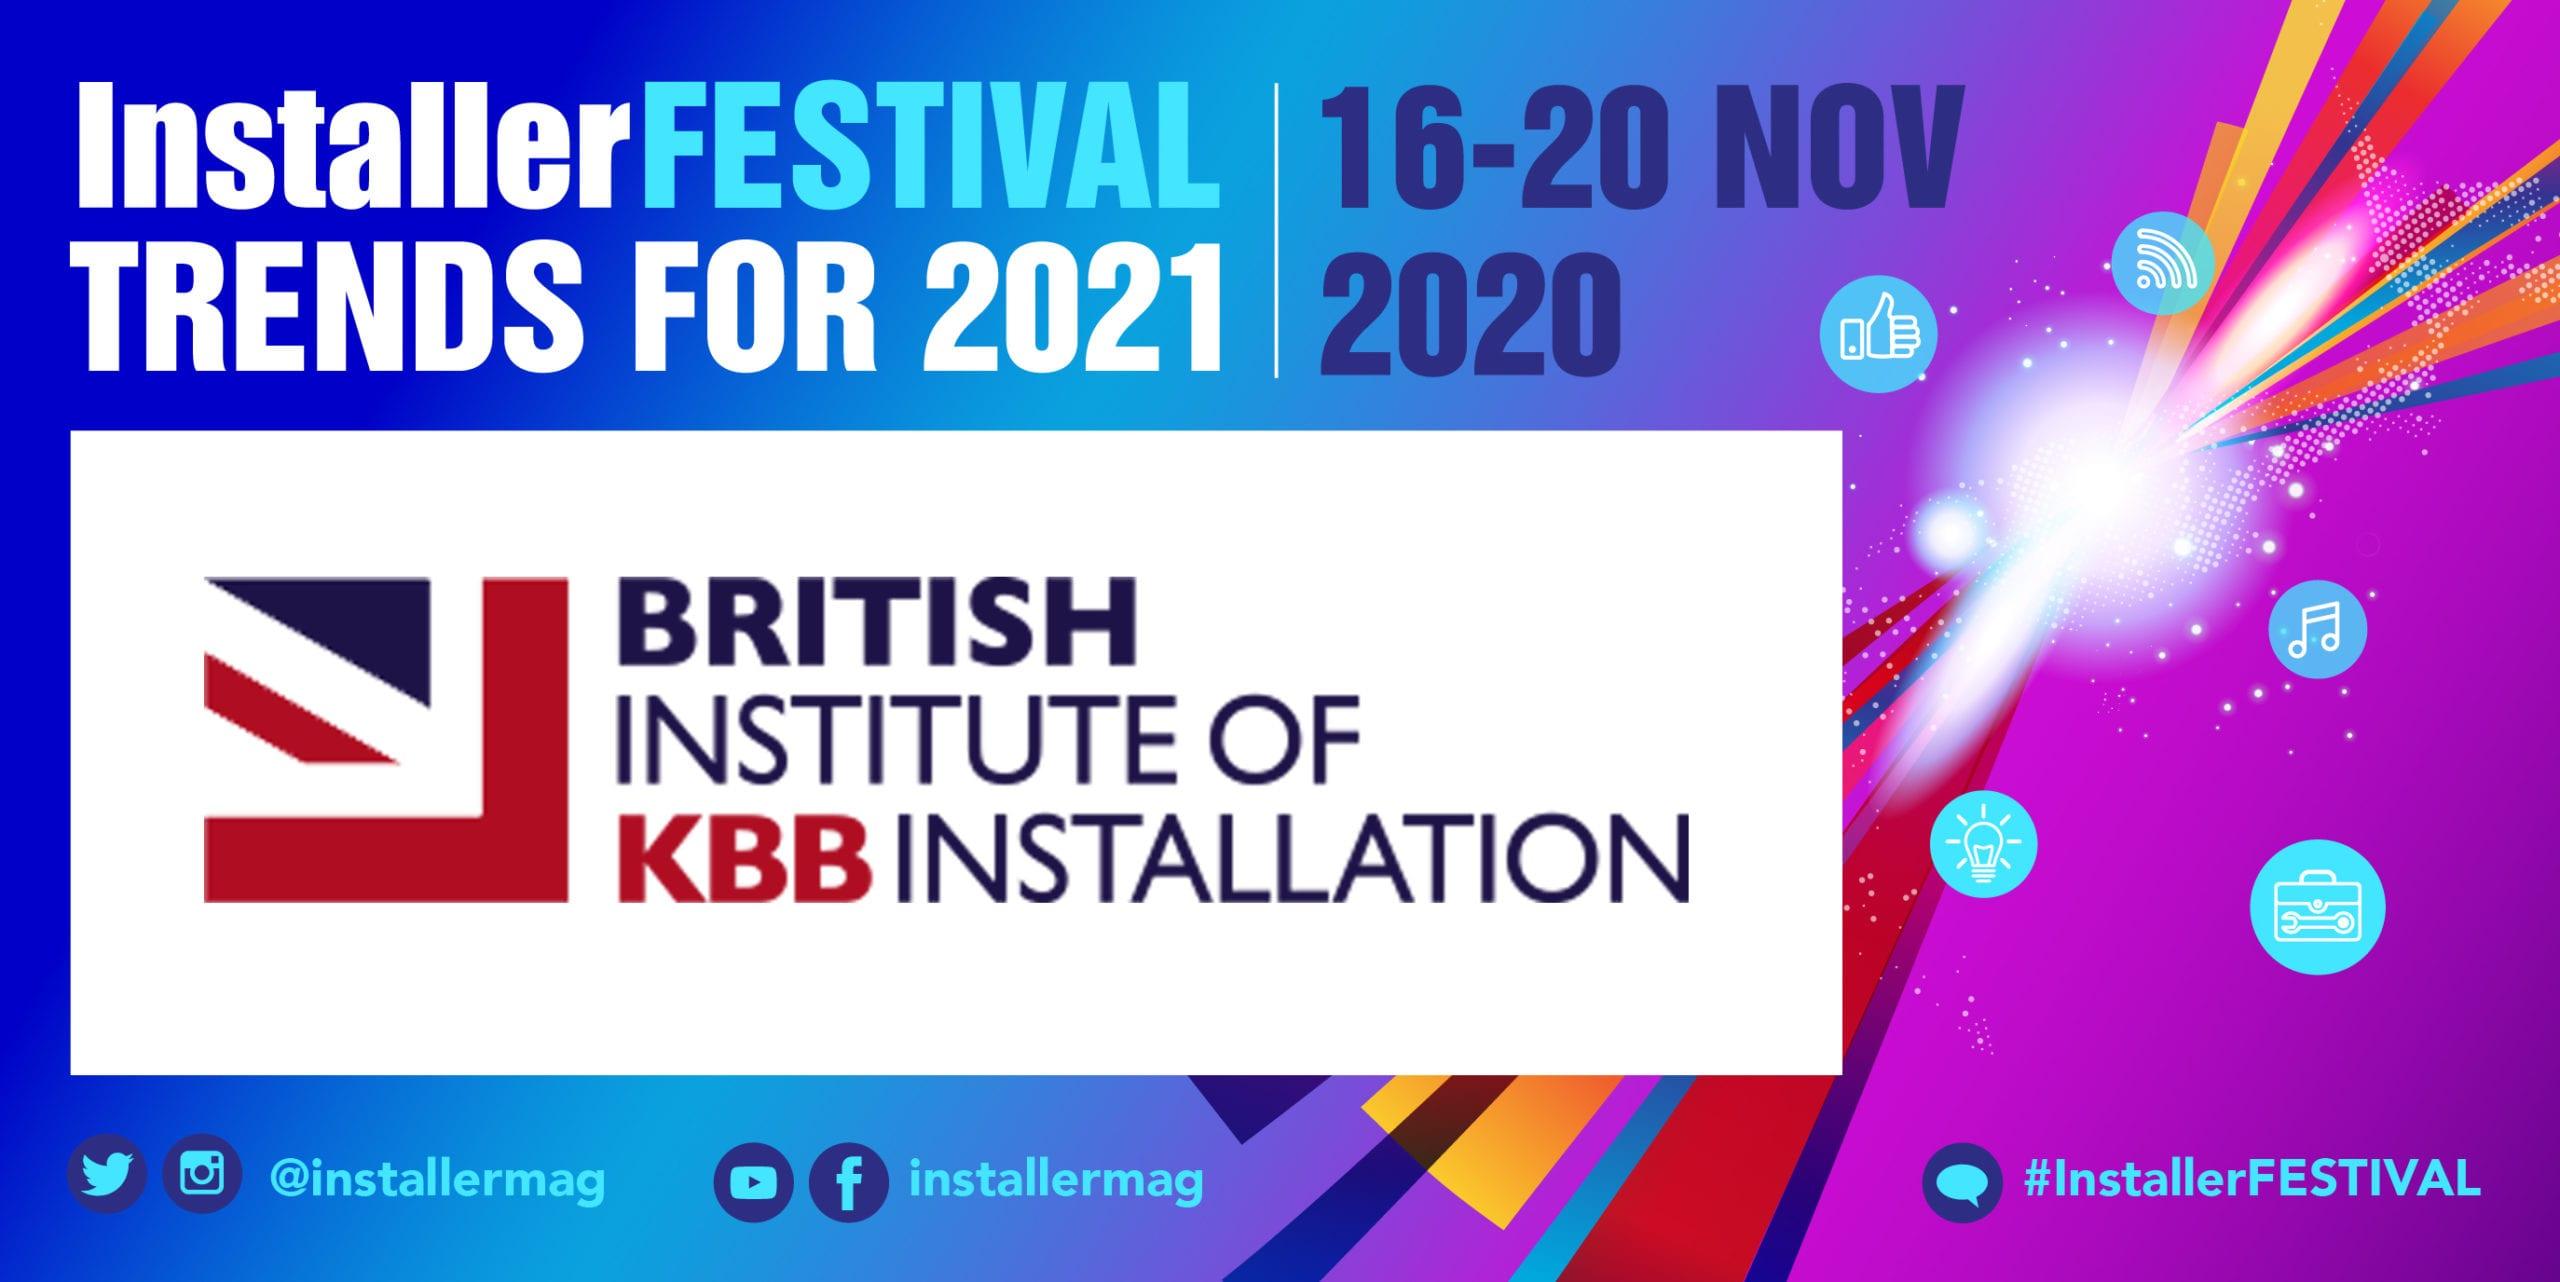 Popular - Installer hosts Q&A with BiKBBI at InstallerFESTIVAL